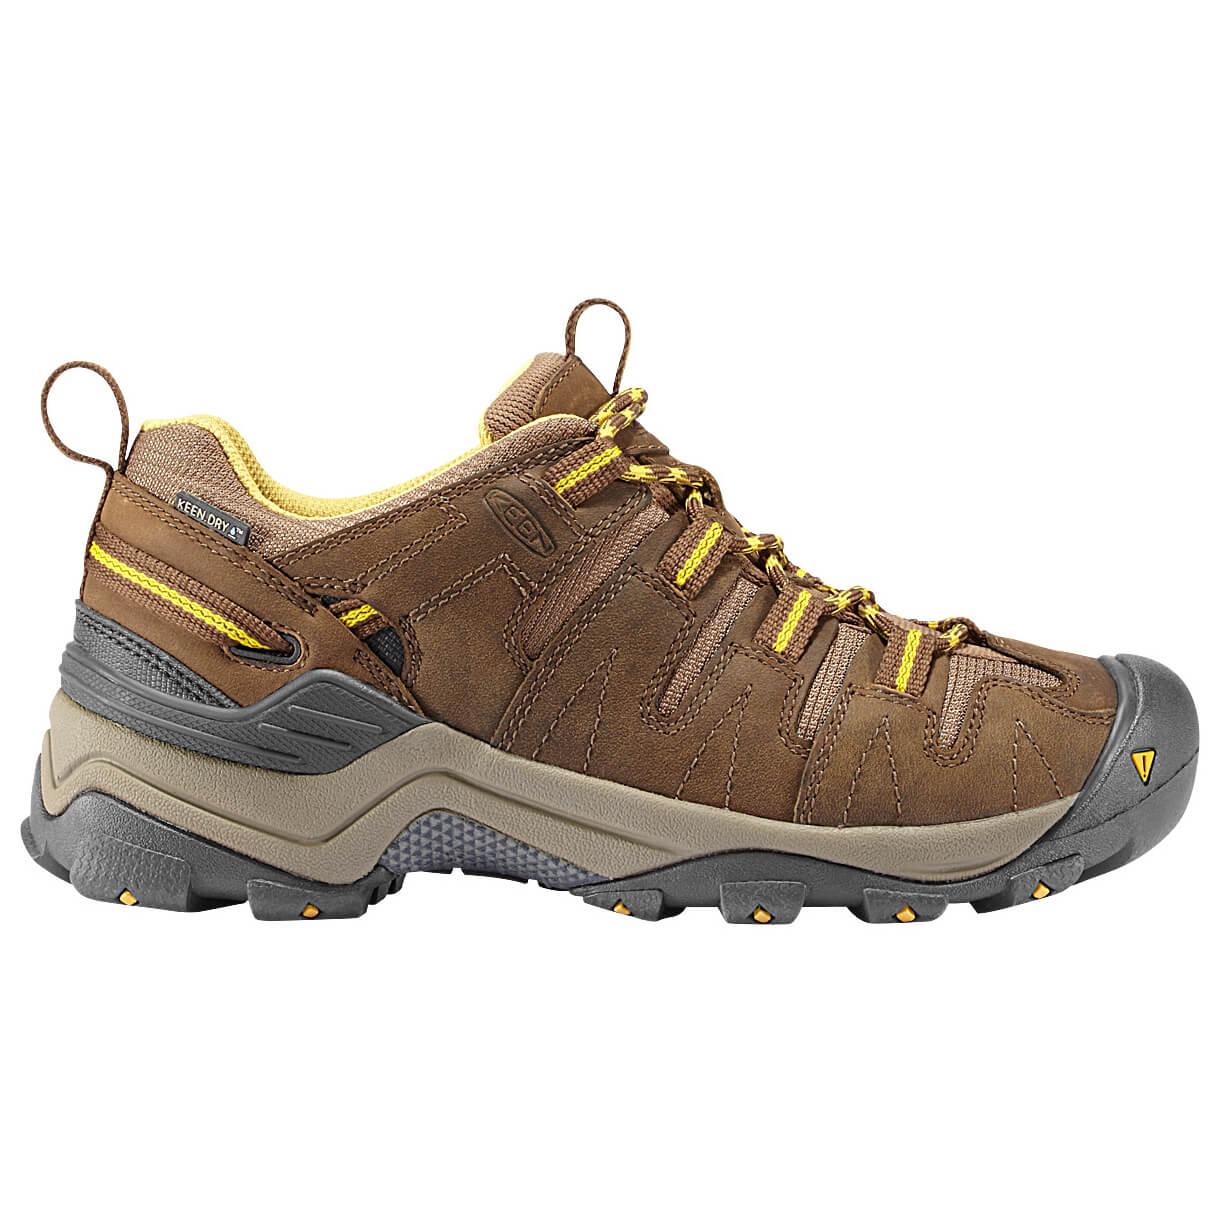 de79f2bf7e42 Keen - Women s Gypsum - Approach shoes